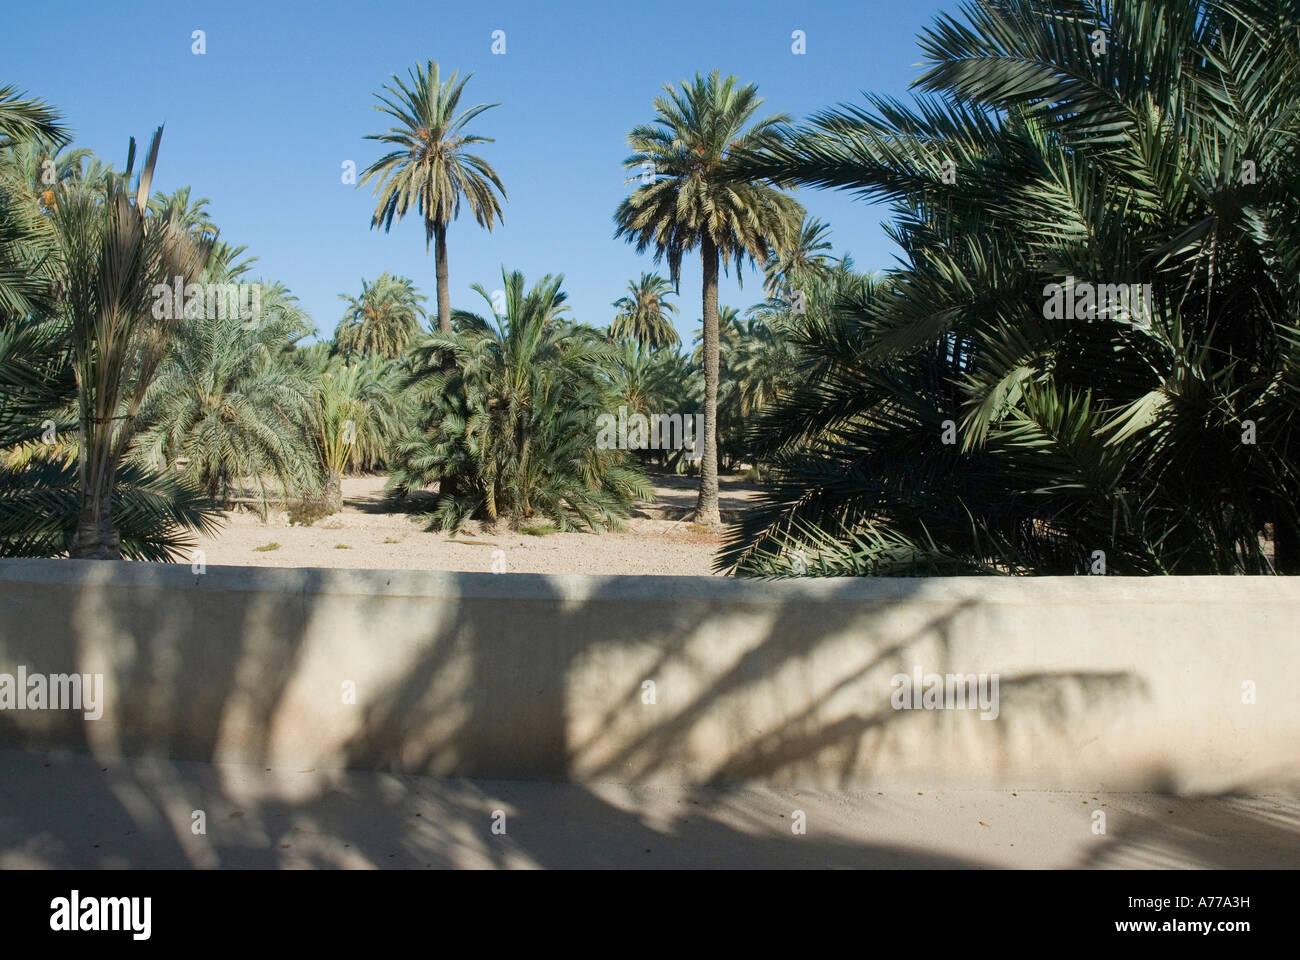 Almassera path in The Elx Palm Grove ELCHE Spain - Stock Image